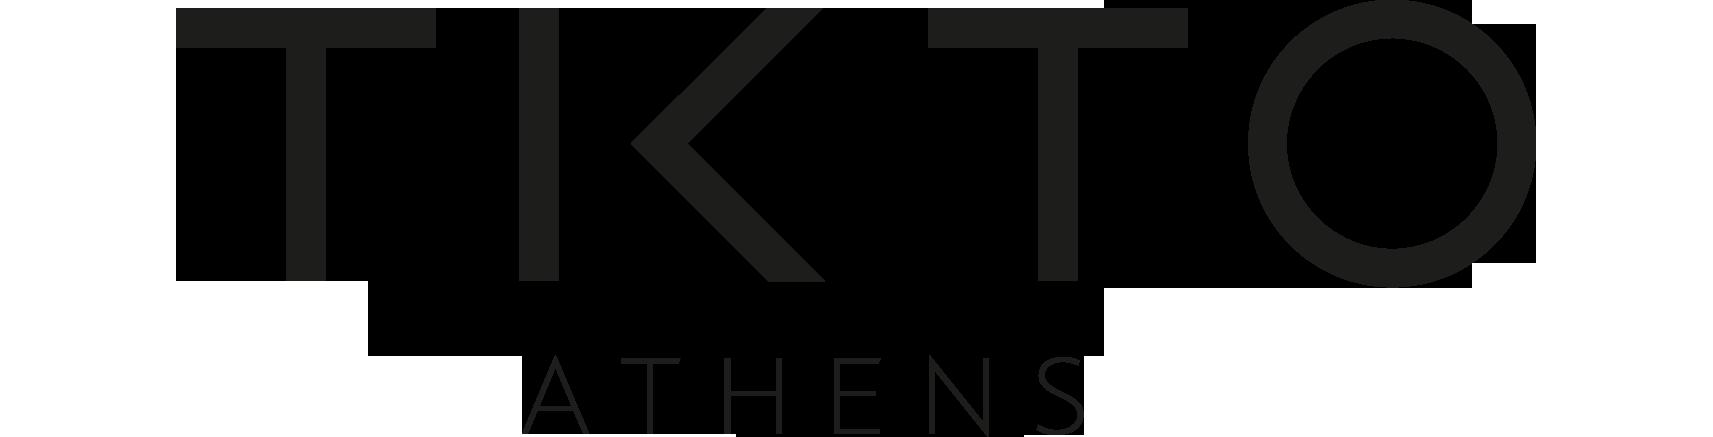 tikto-logo-site tikto, tikto athens, handmade cloths, greek cloths, handmade greek clothes, handmade greek fashion, greek designer, fashion brand, greek brand, greek products